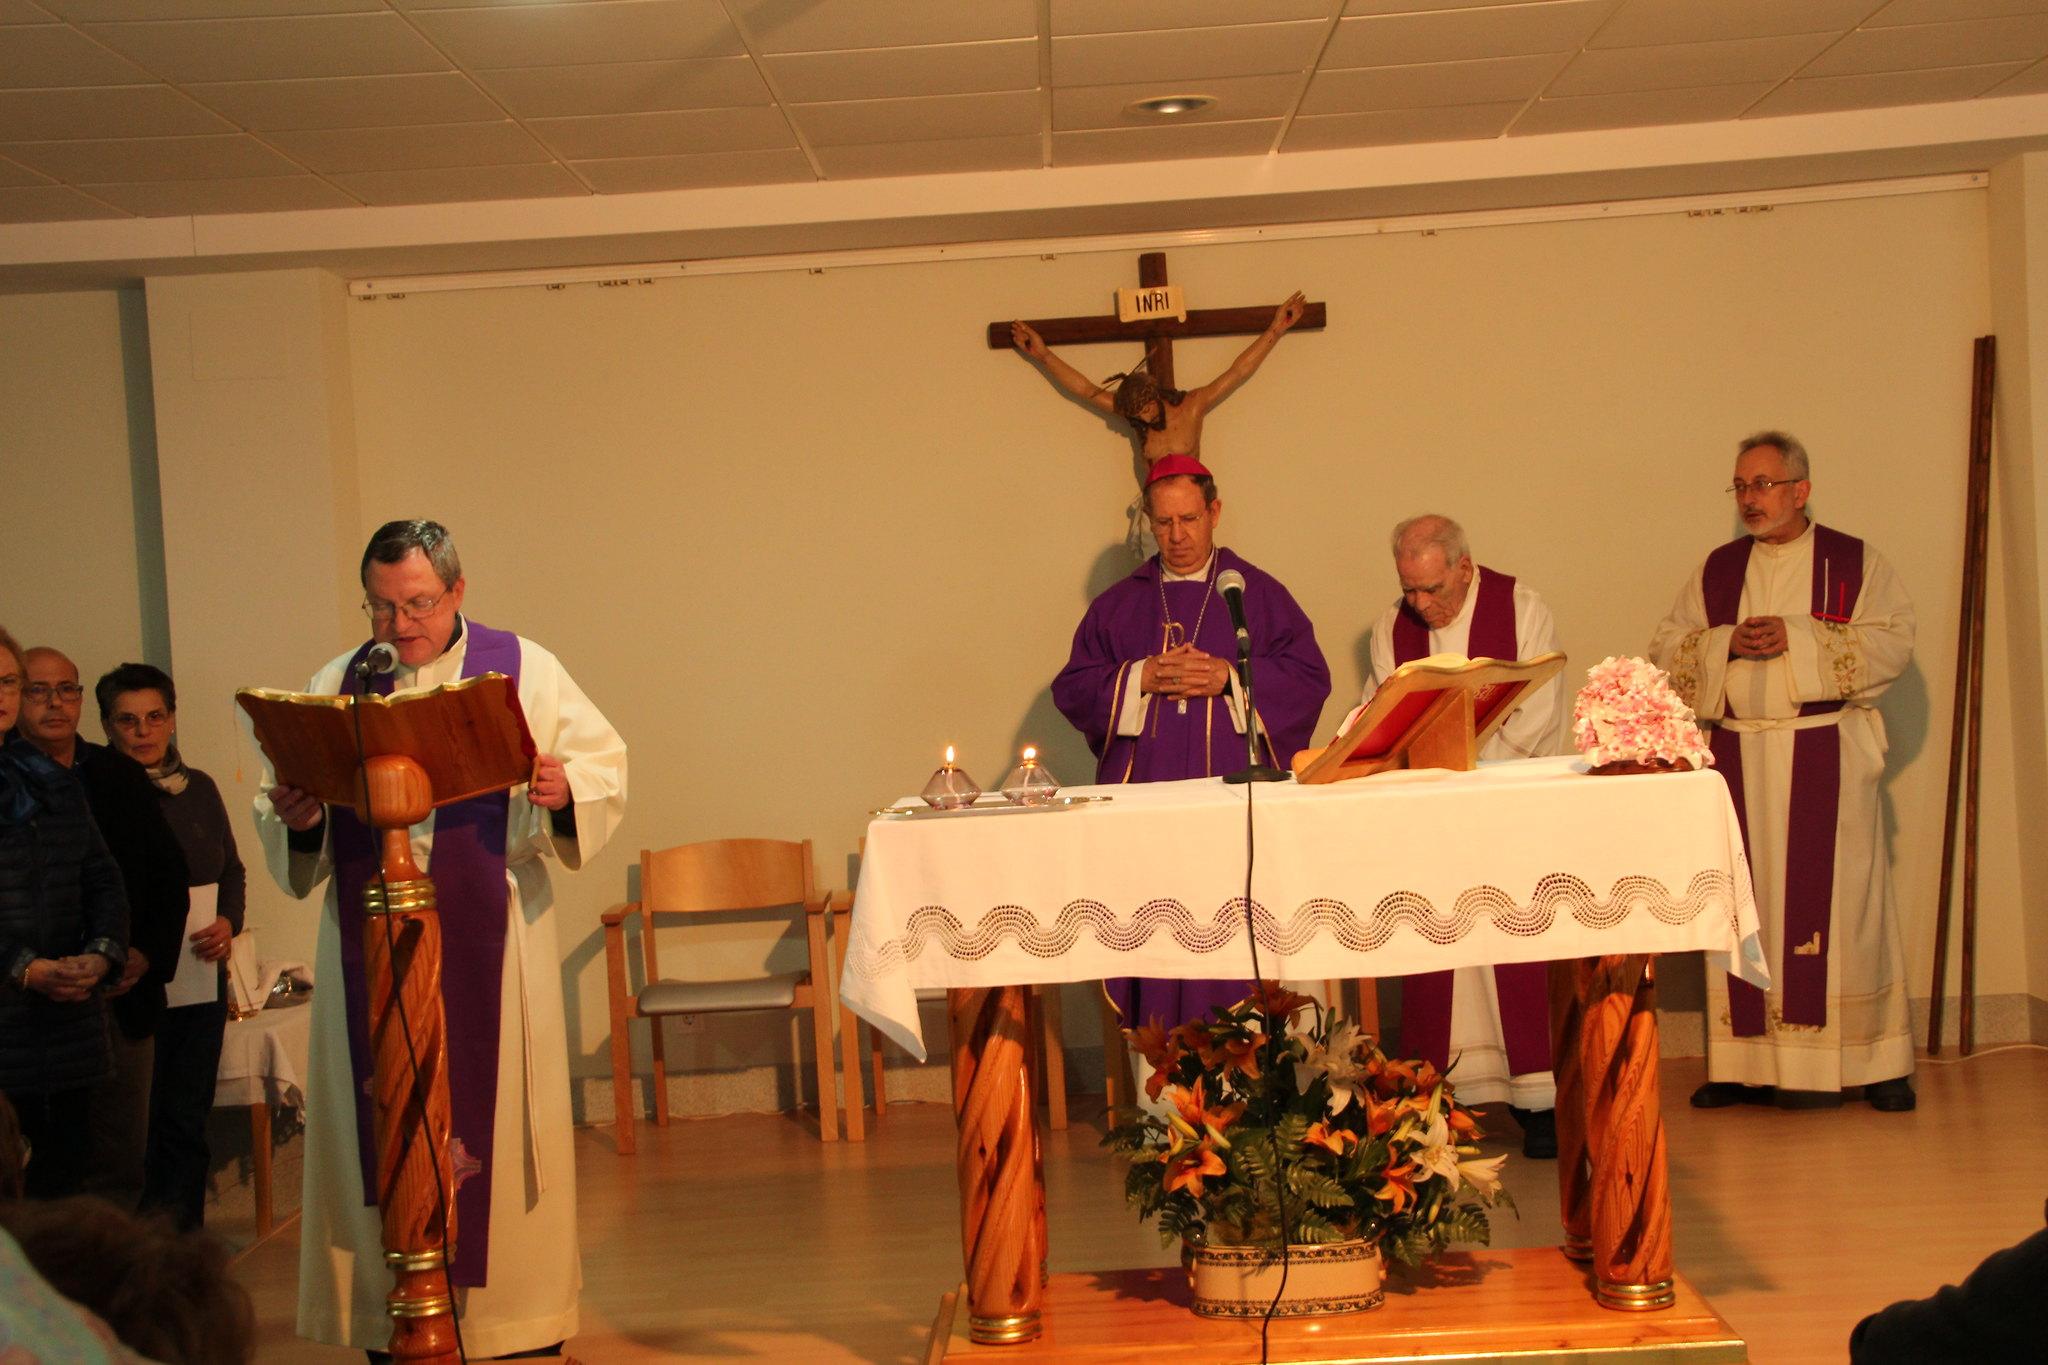 (2016-02-13) - Inauguración Virgen De Lourdes, La Molineta - Archivo La Molineta (017)